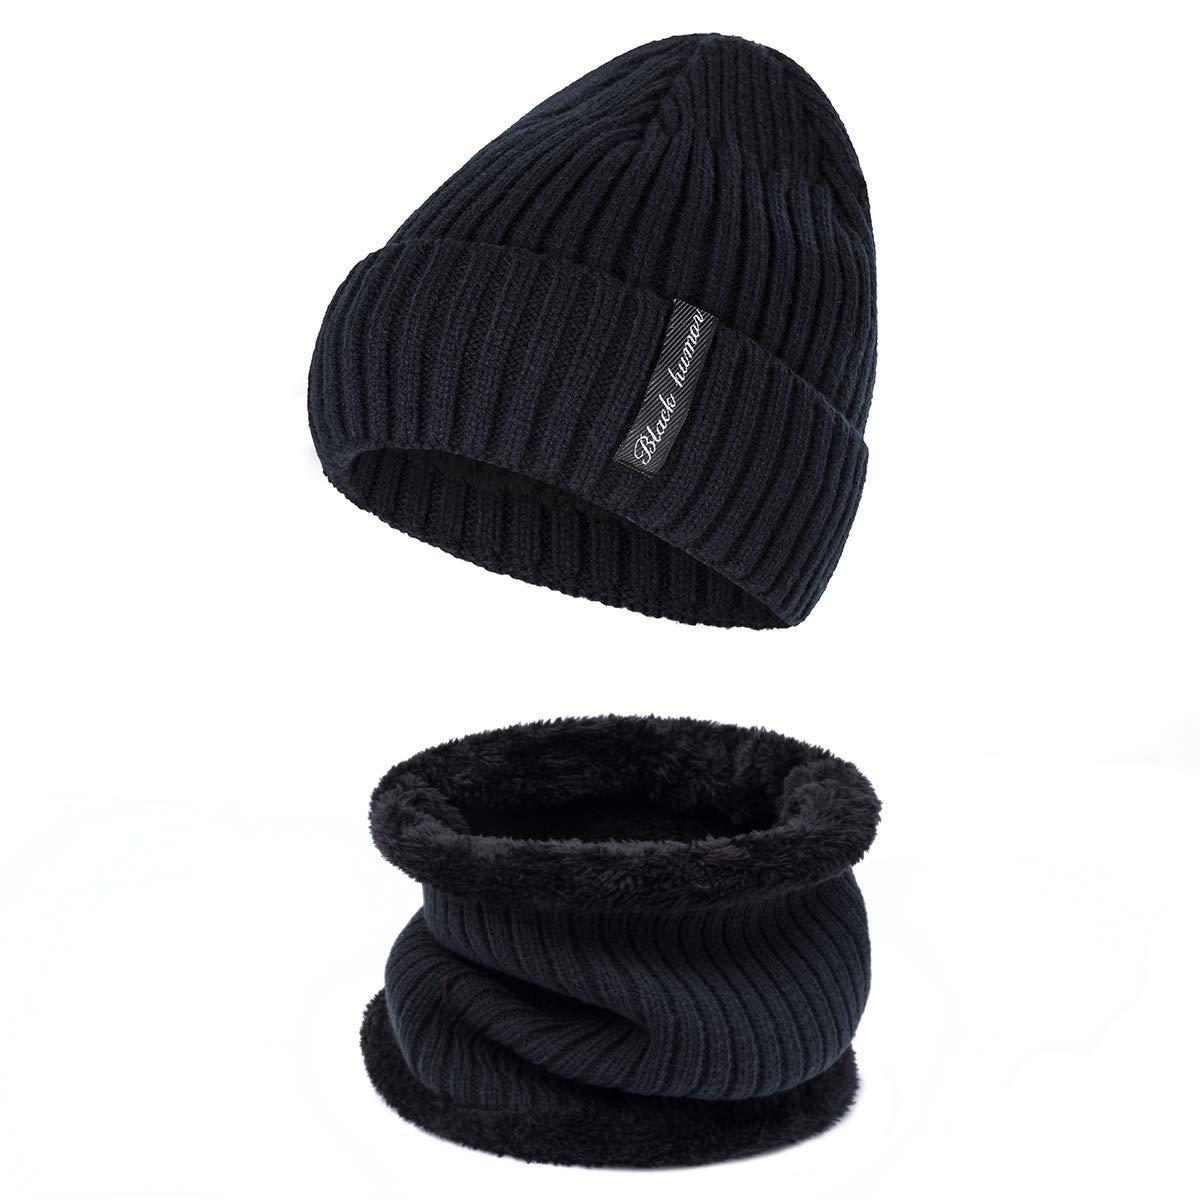 9903b74f913 Get Quotations · Hat Scarf Set yeabiu Unisex Winter Beanie Slouchy Warm  Knit Hat and Infinity Scarf Warm Soft